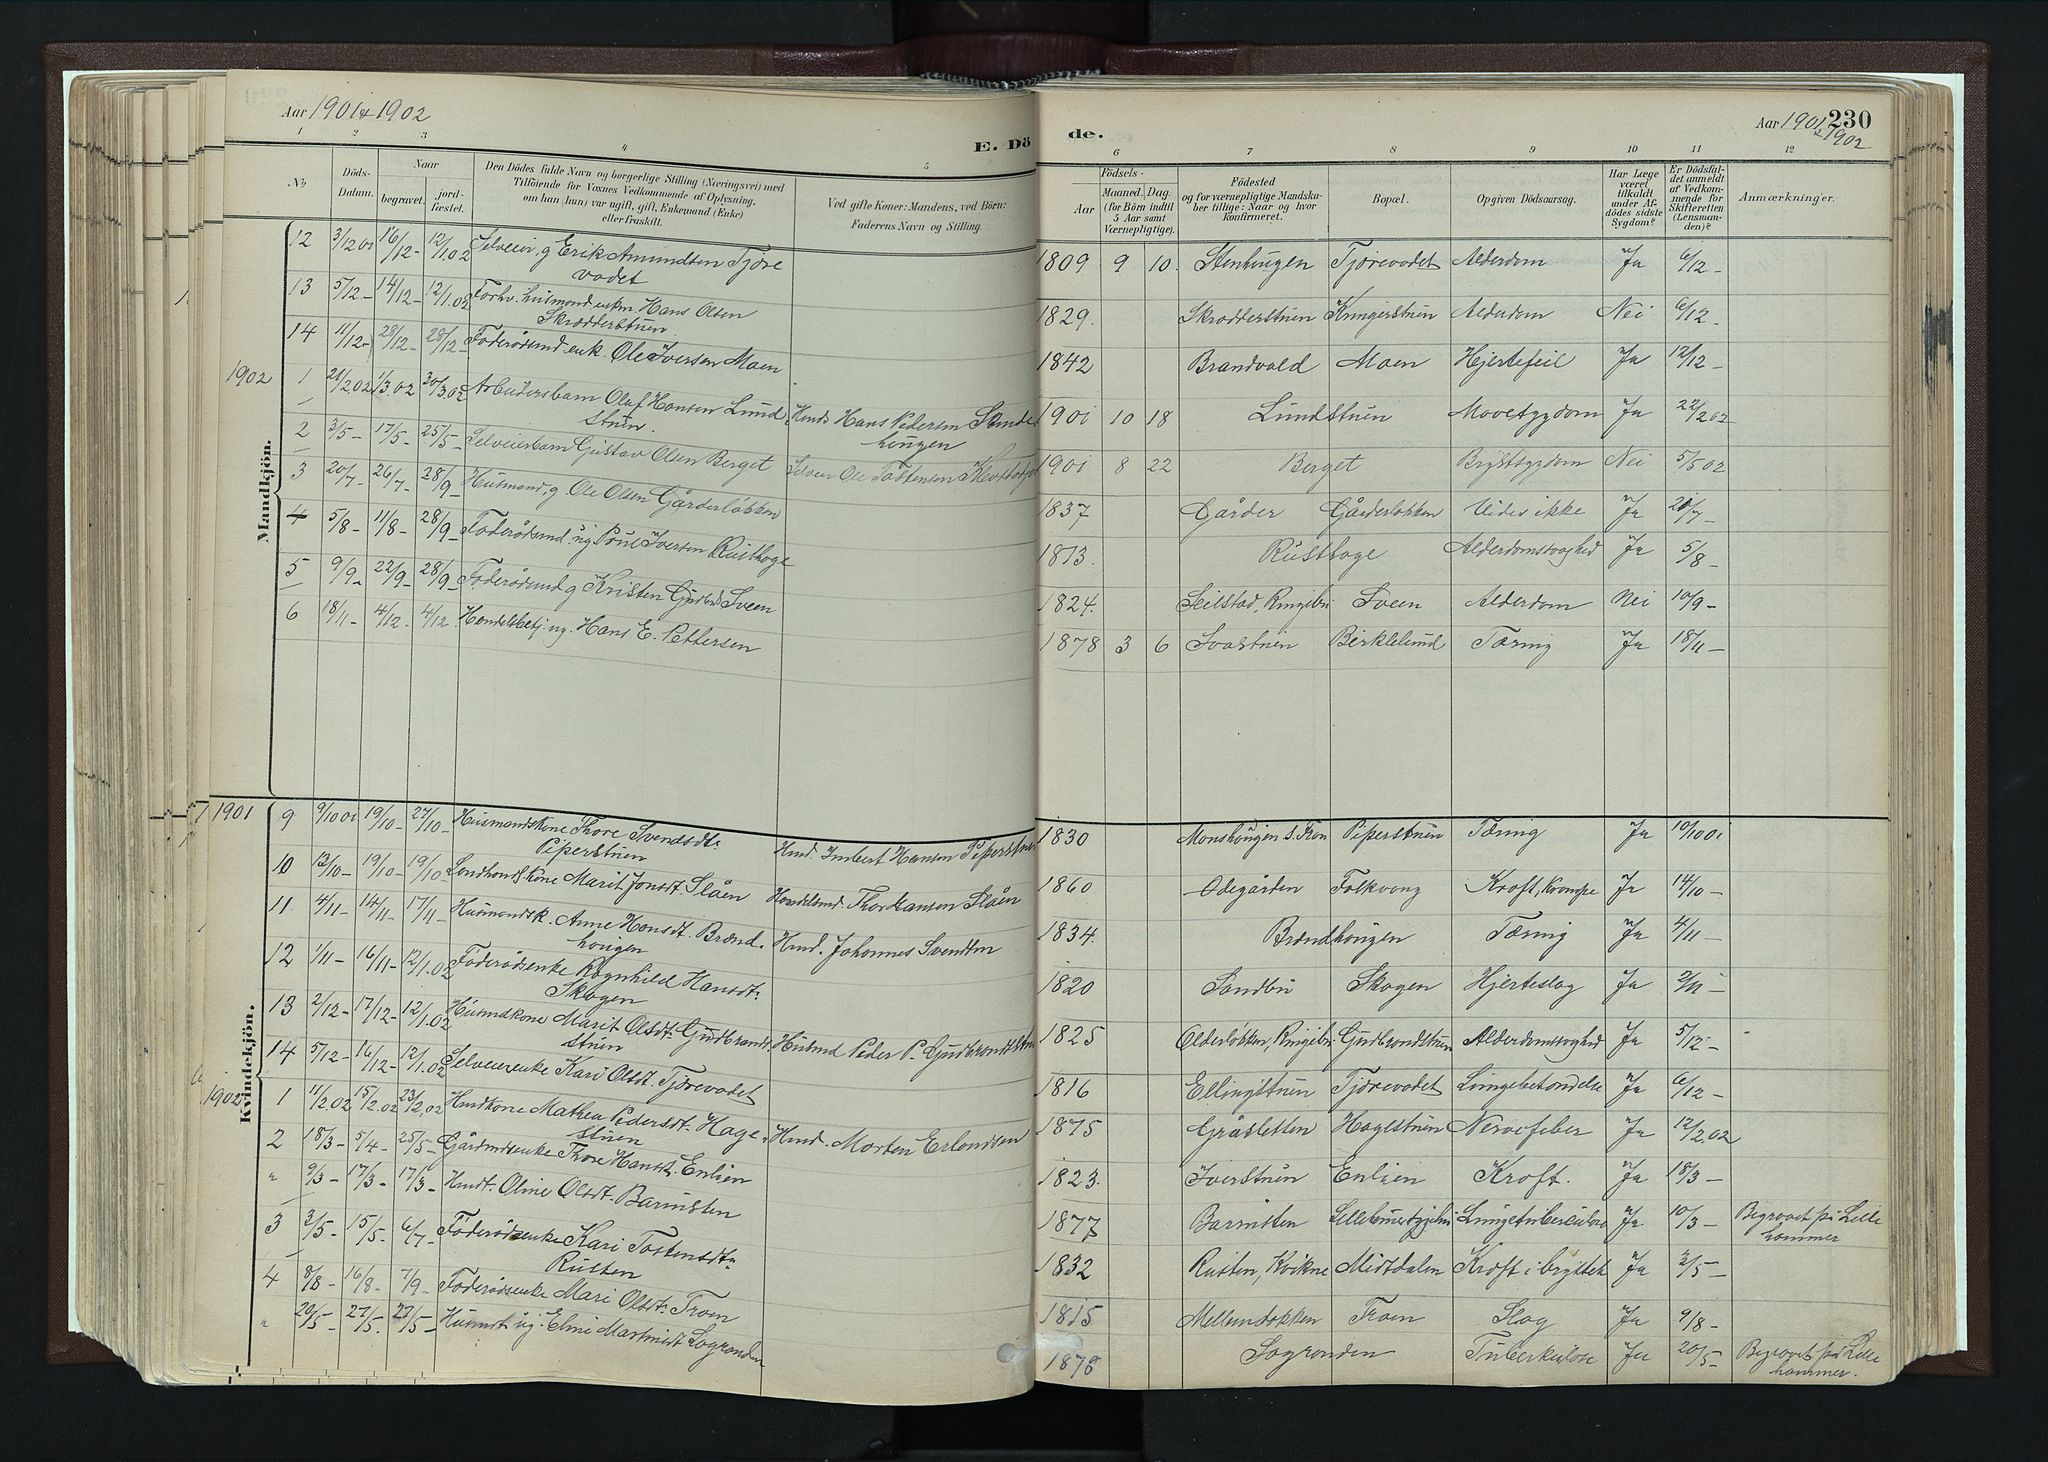 SAH, Nord-Fron prestekontor, Ministerialbok nr. 4, 1884-1914, s. 230